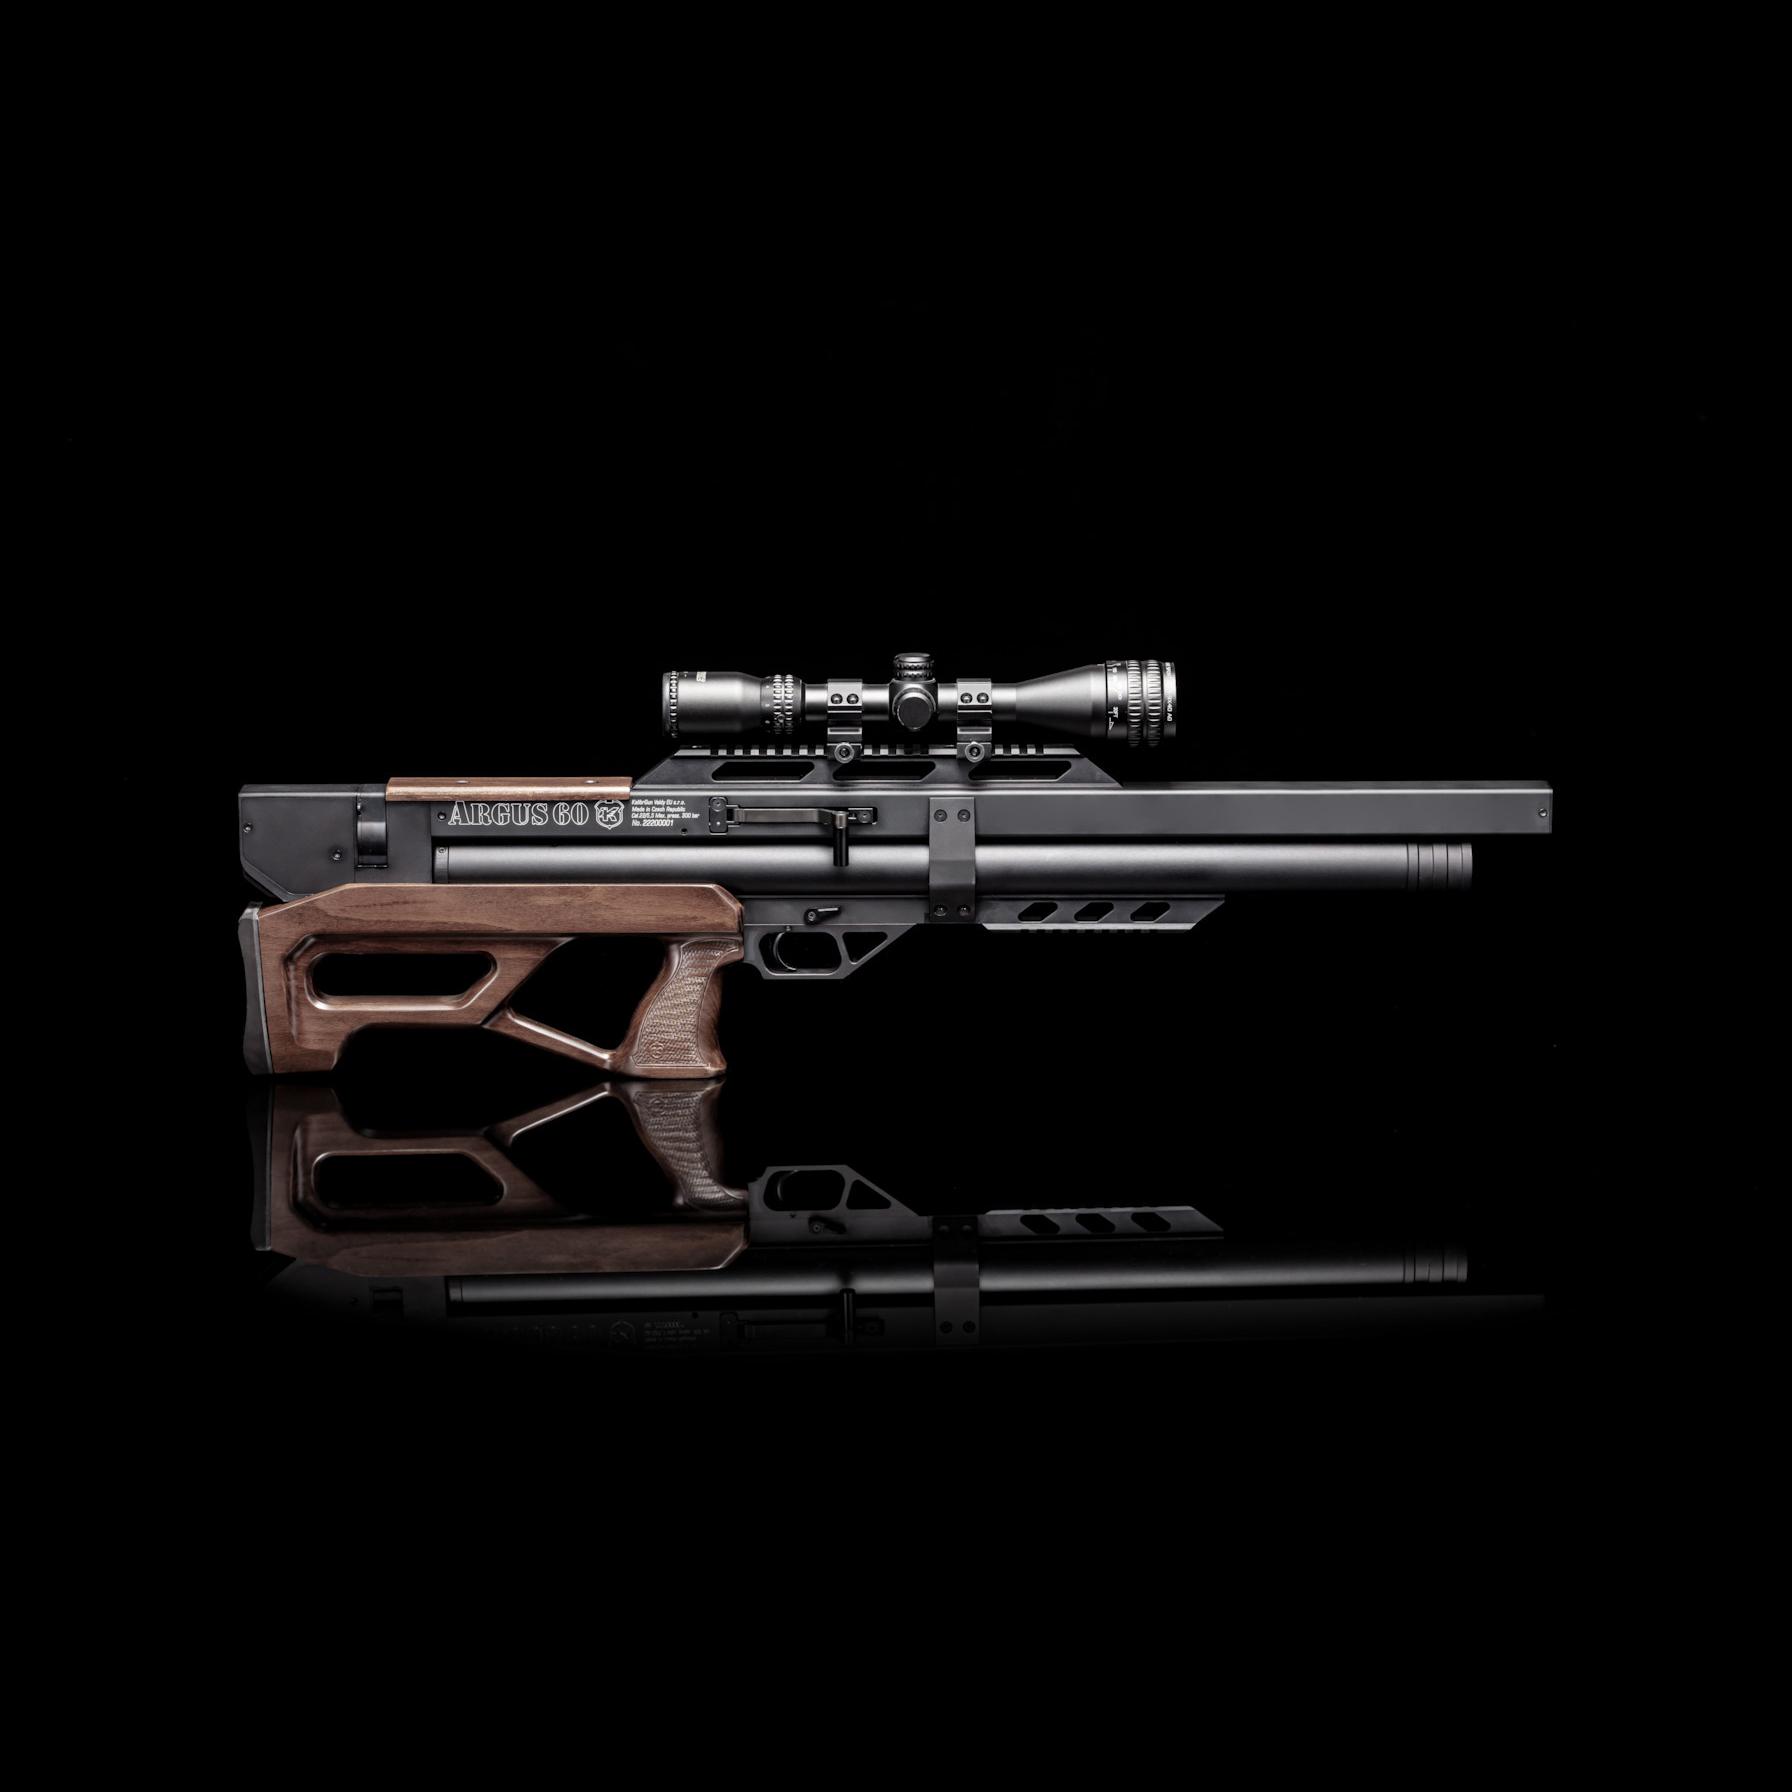 винтовка Cricket Argus 60 W 5,5 мм